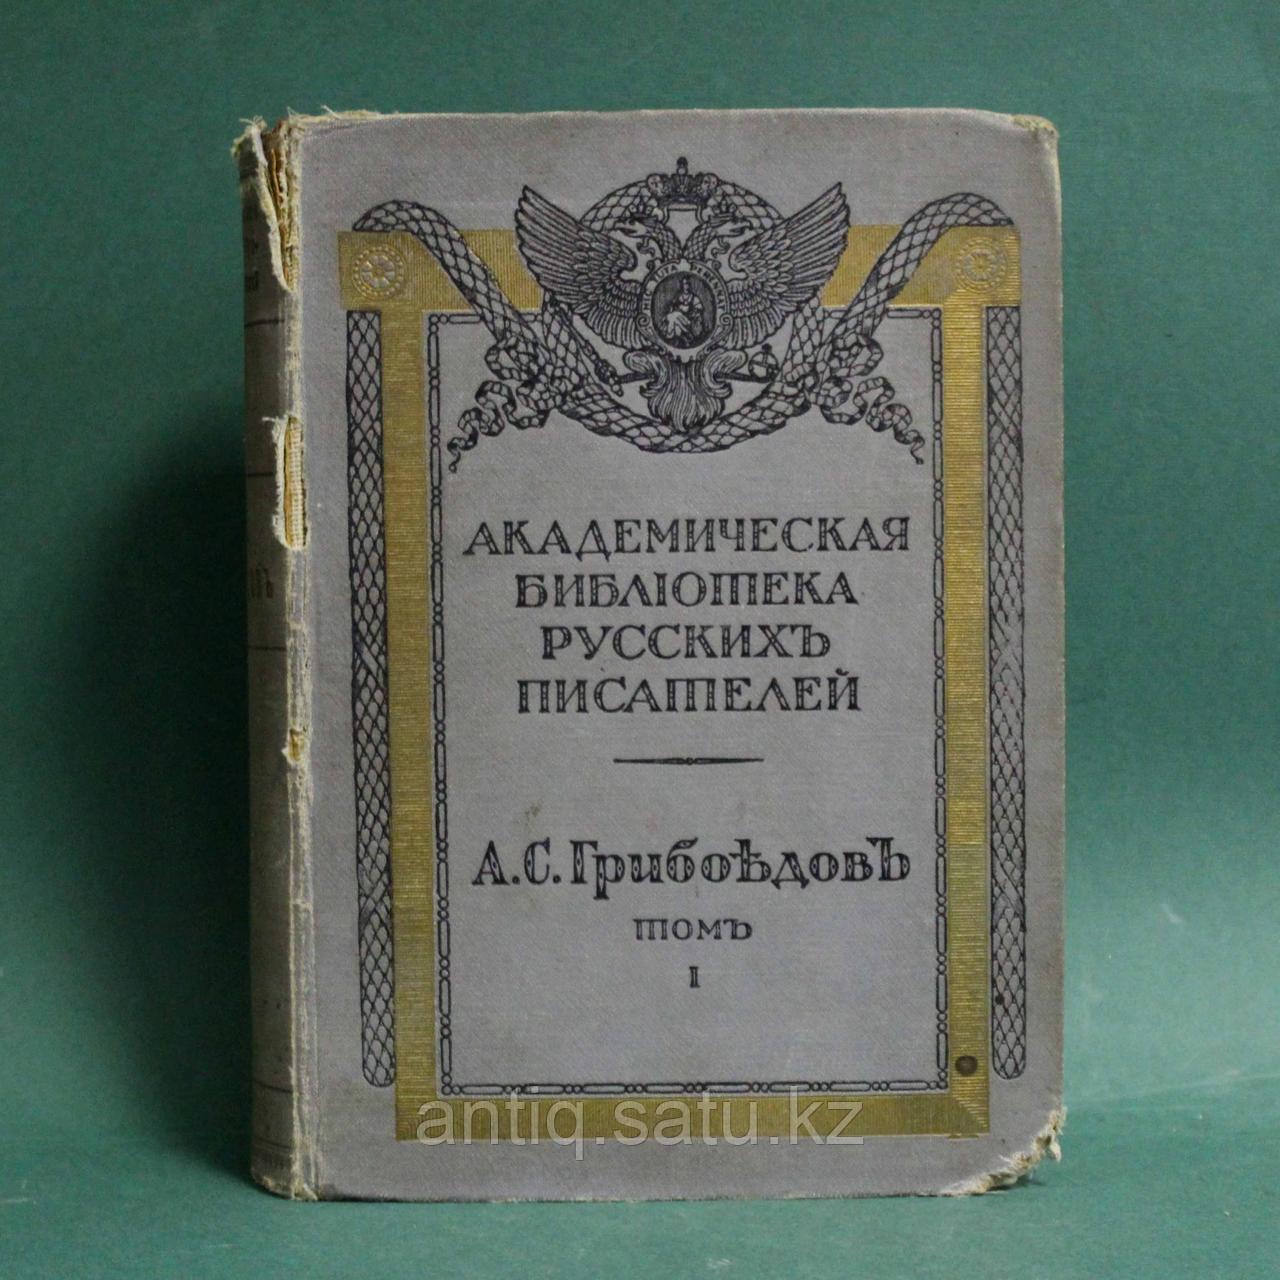 ПОЛНОЕ СОБРАНИЕ СОЧИНЕНИЙ А.С. ГРИБОЕДОВА - фото 1